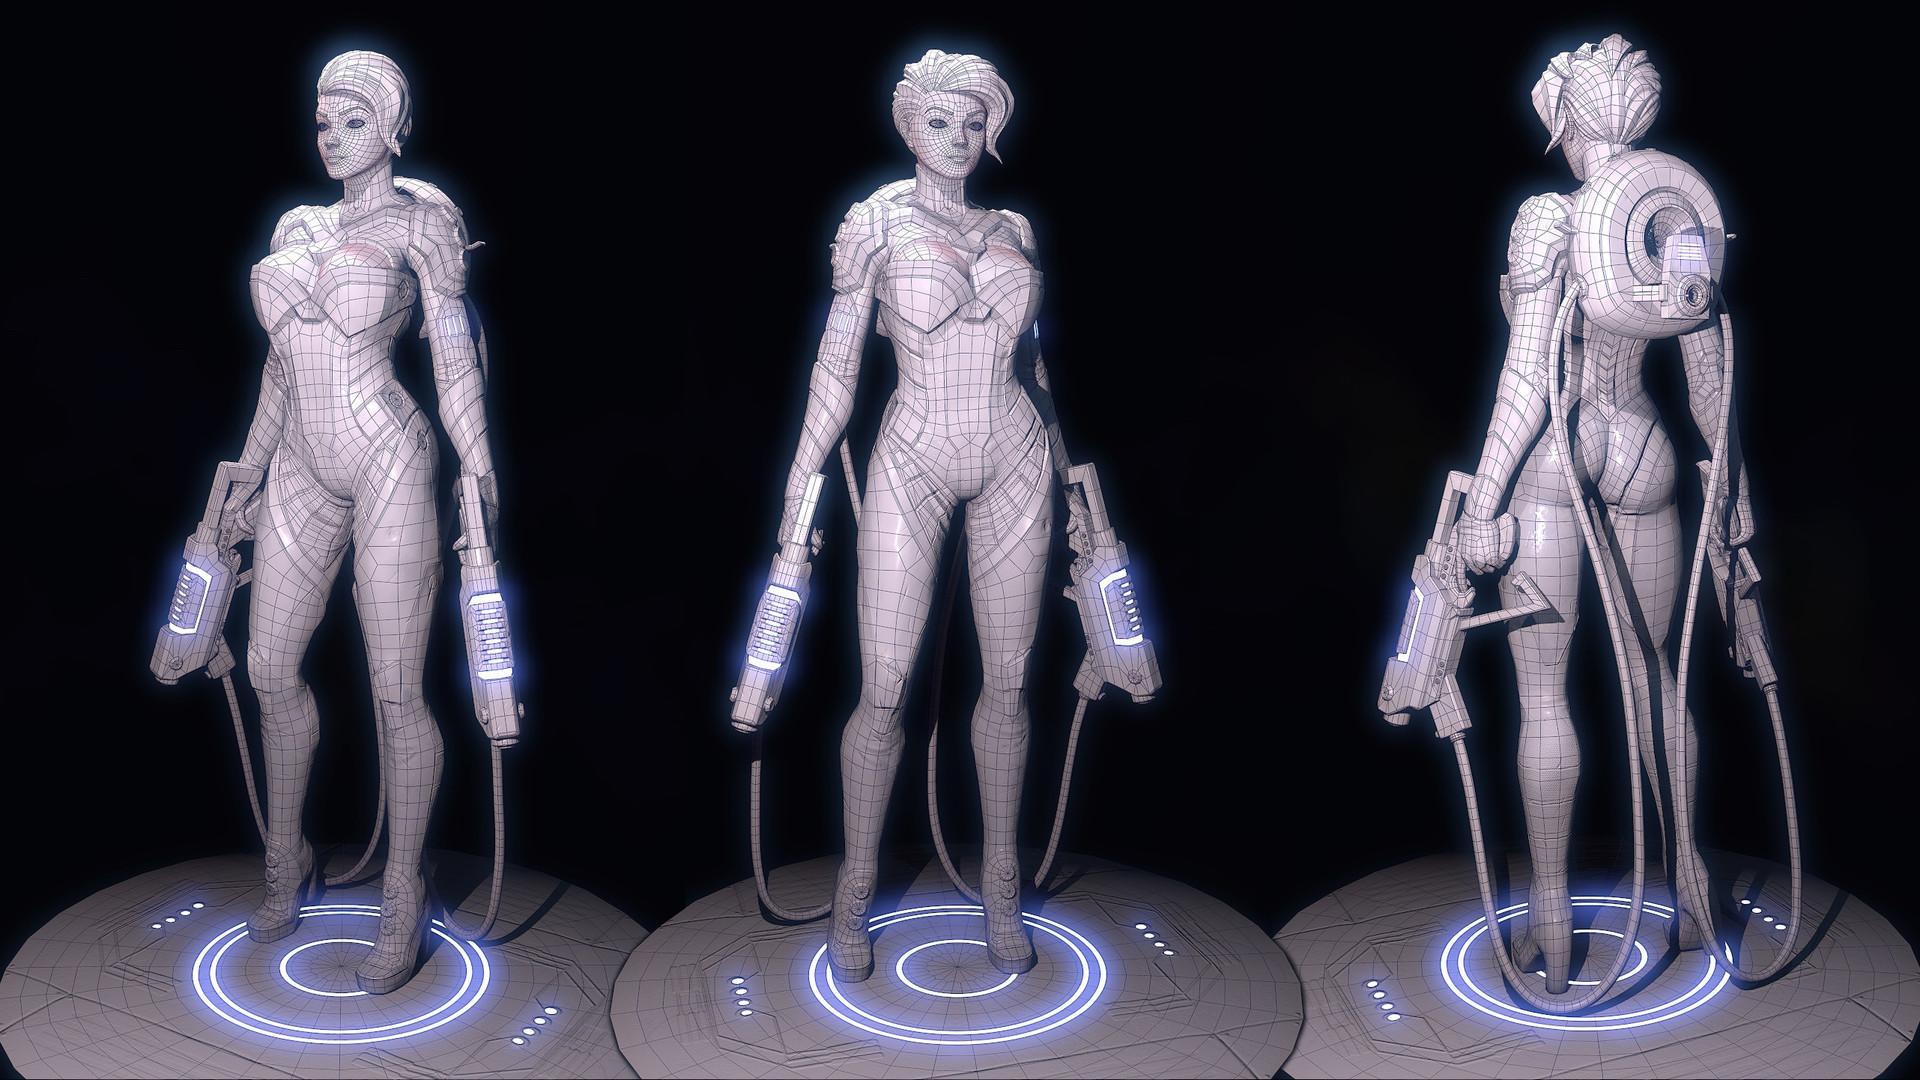 Eren ozel cinder scifi costume design 34 161206